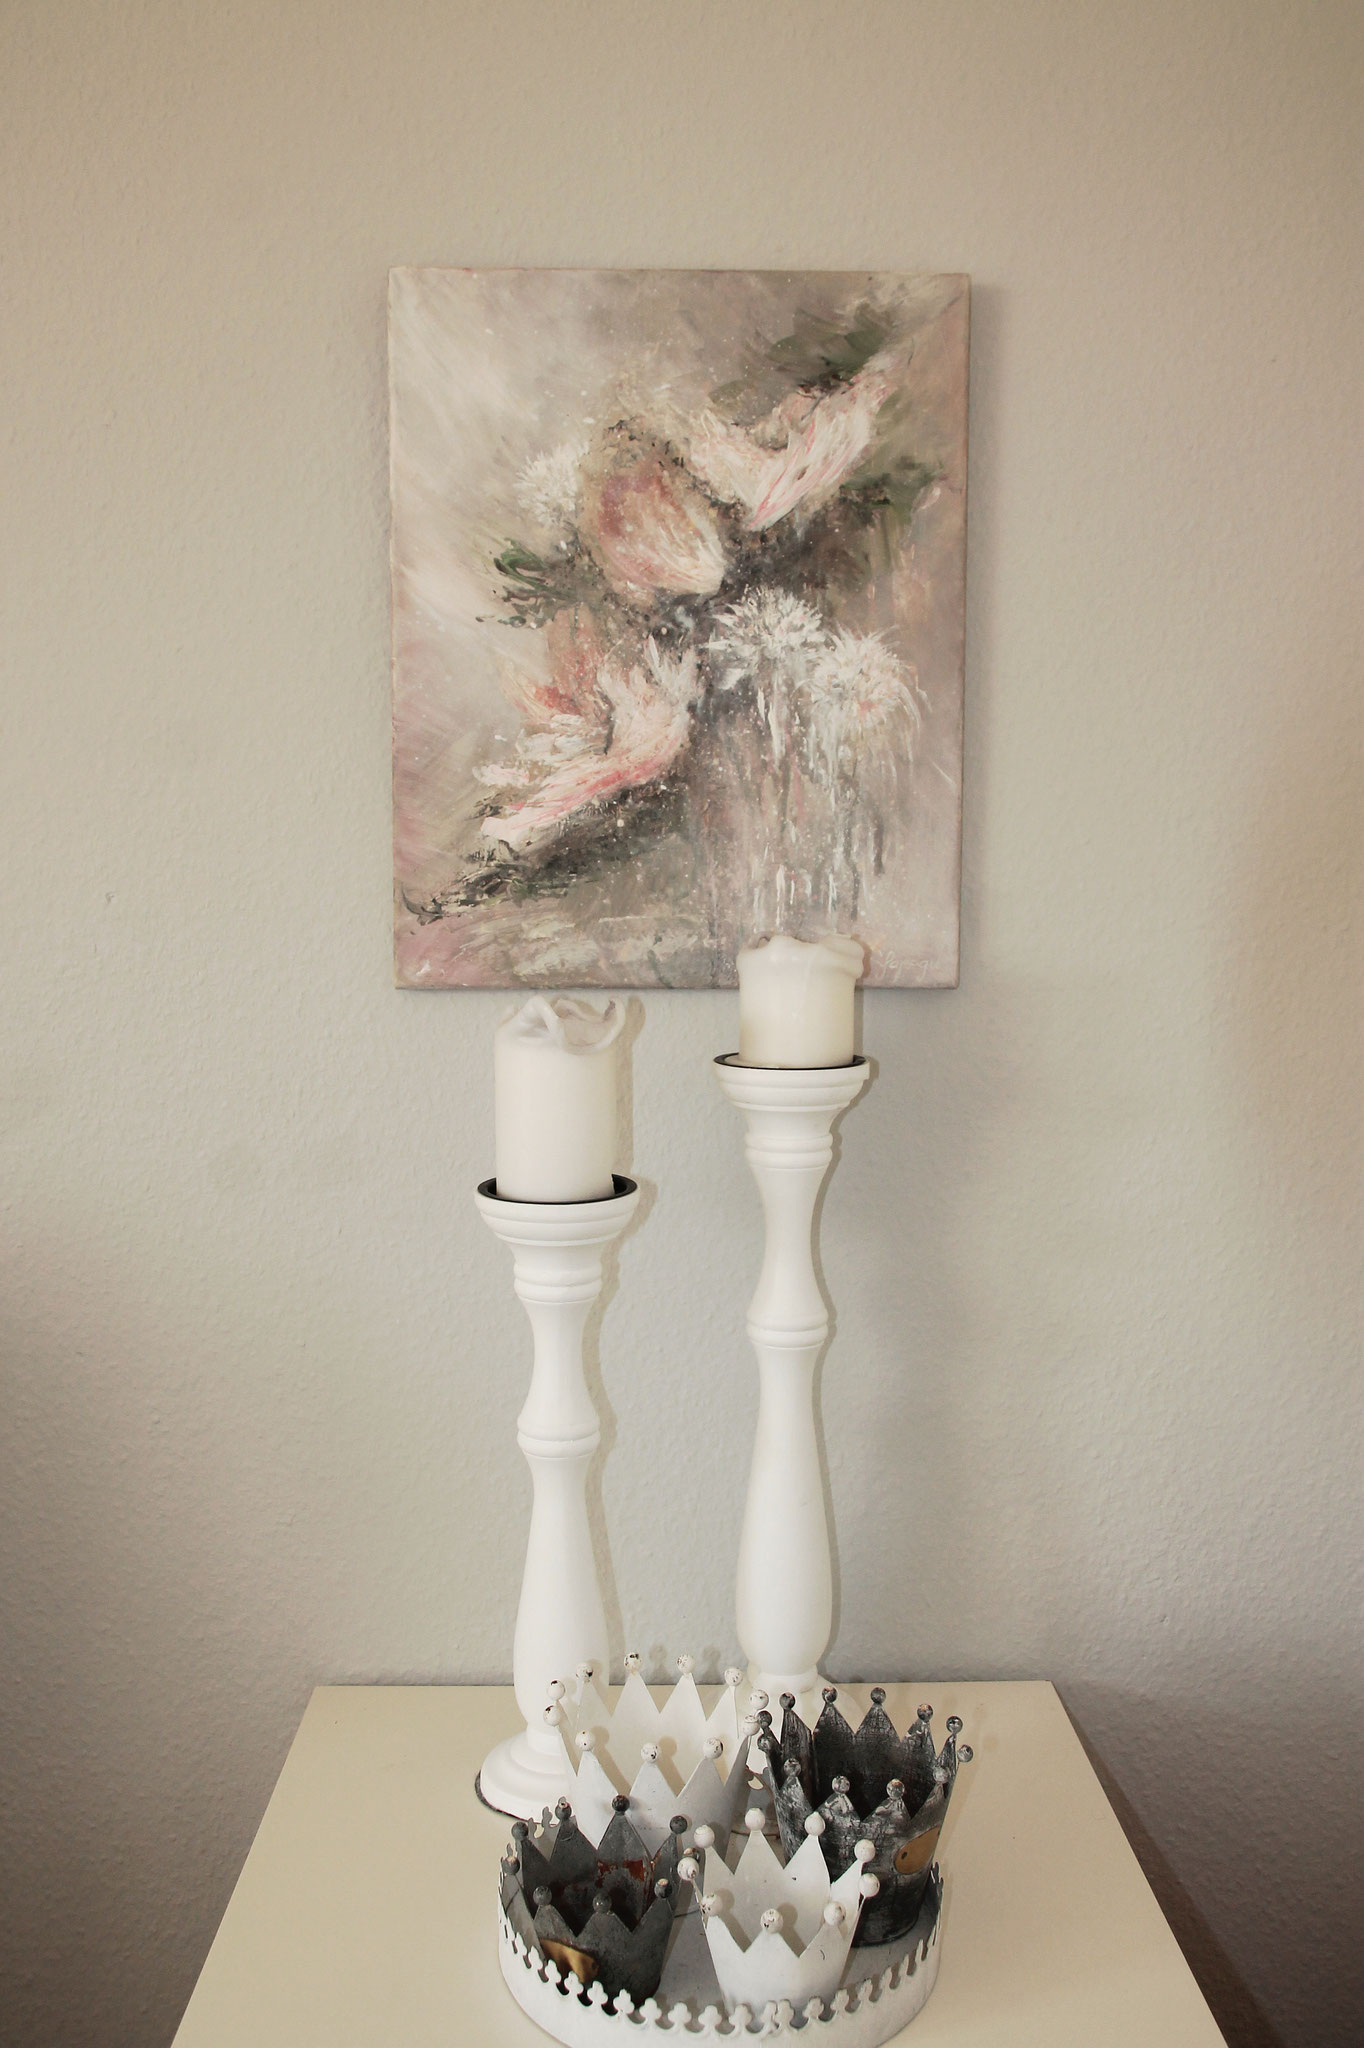 30 x 40 cm Acryl auf Leinwand